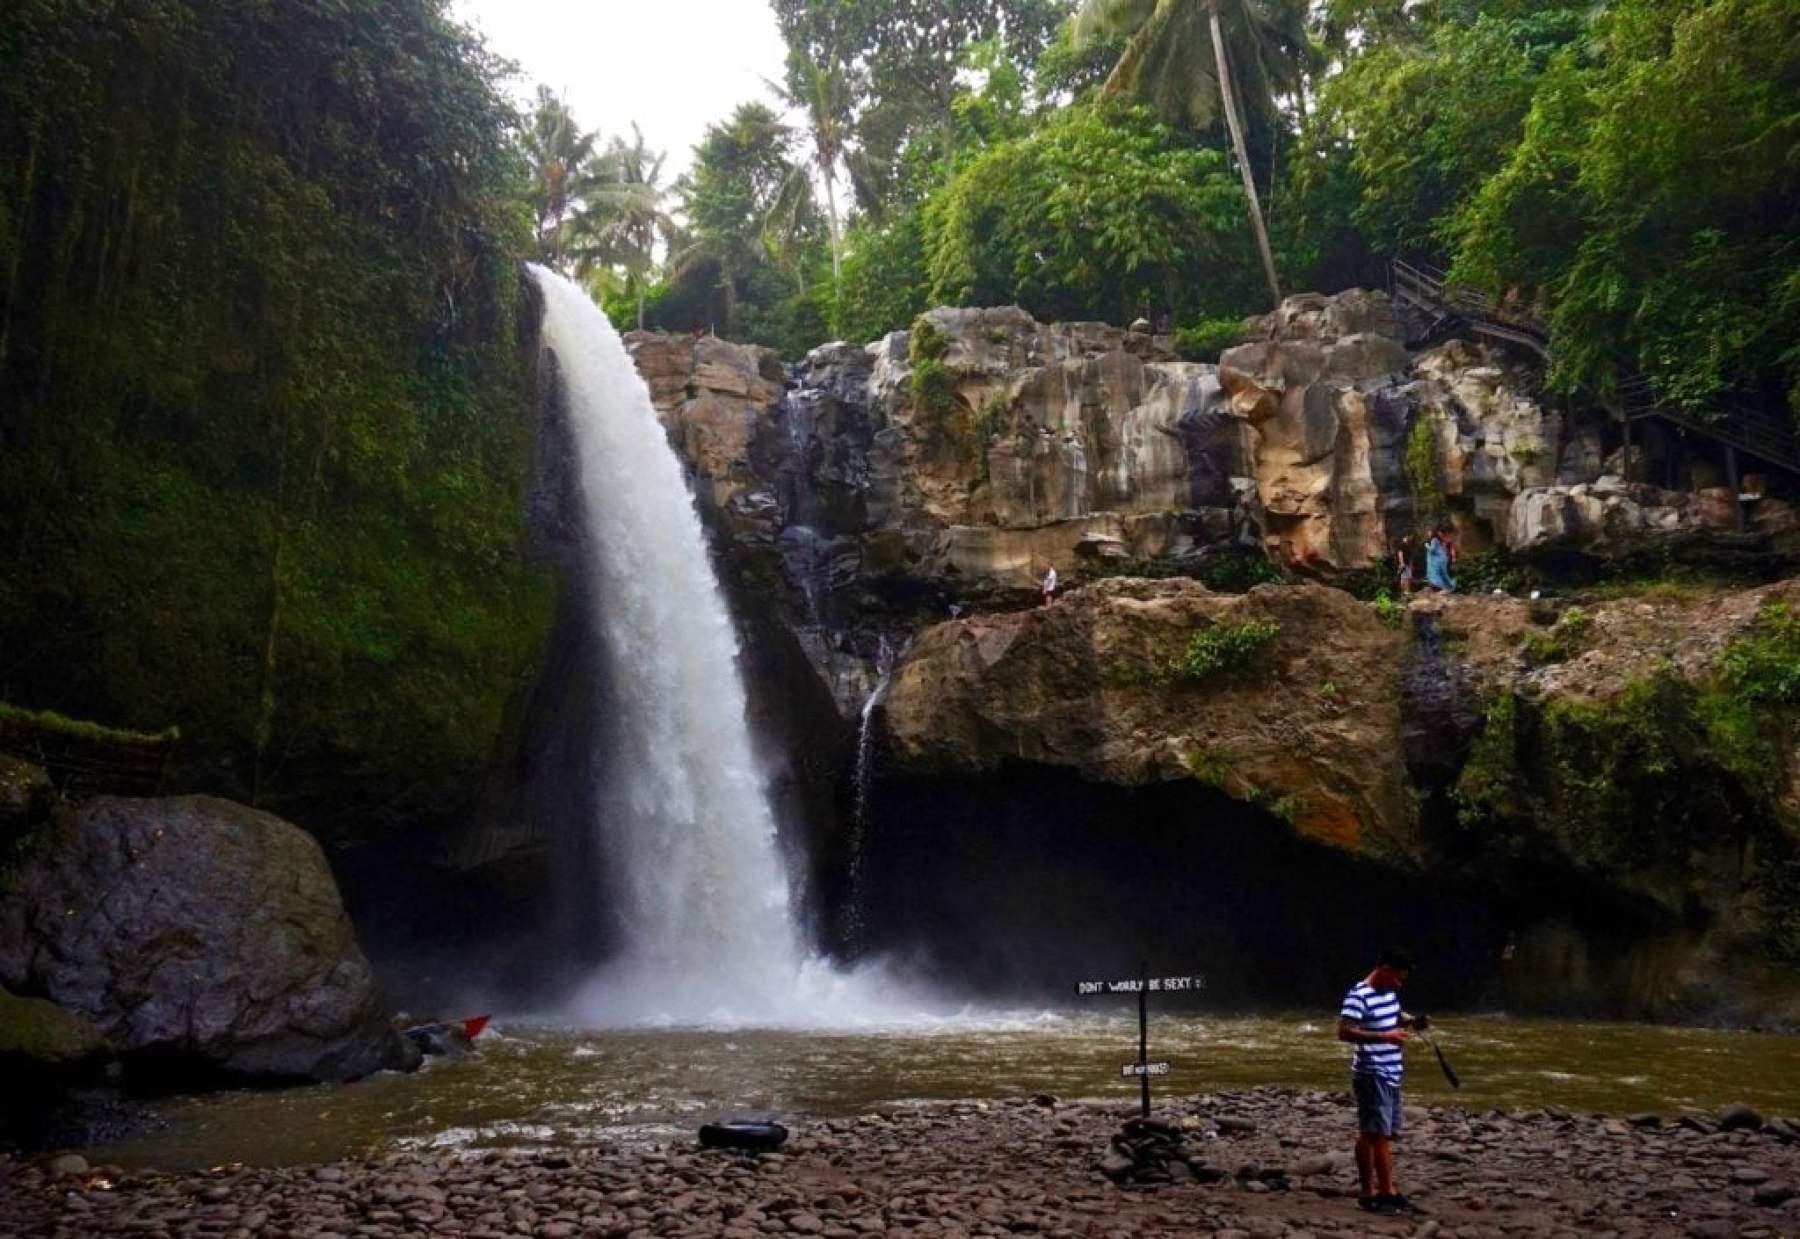 Tegenungan Waterfall | Exploring around Ubud, Bali for a day